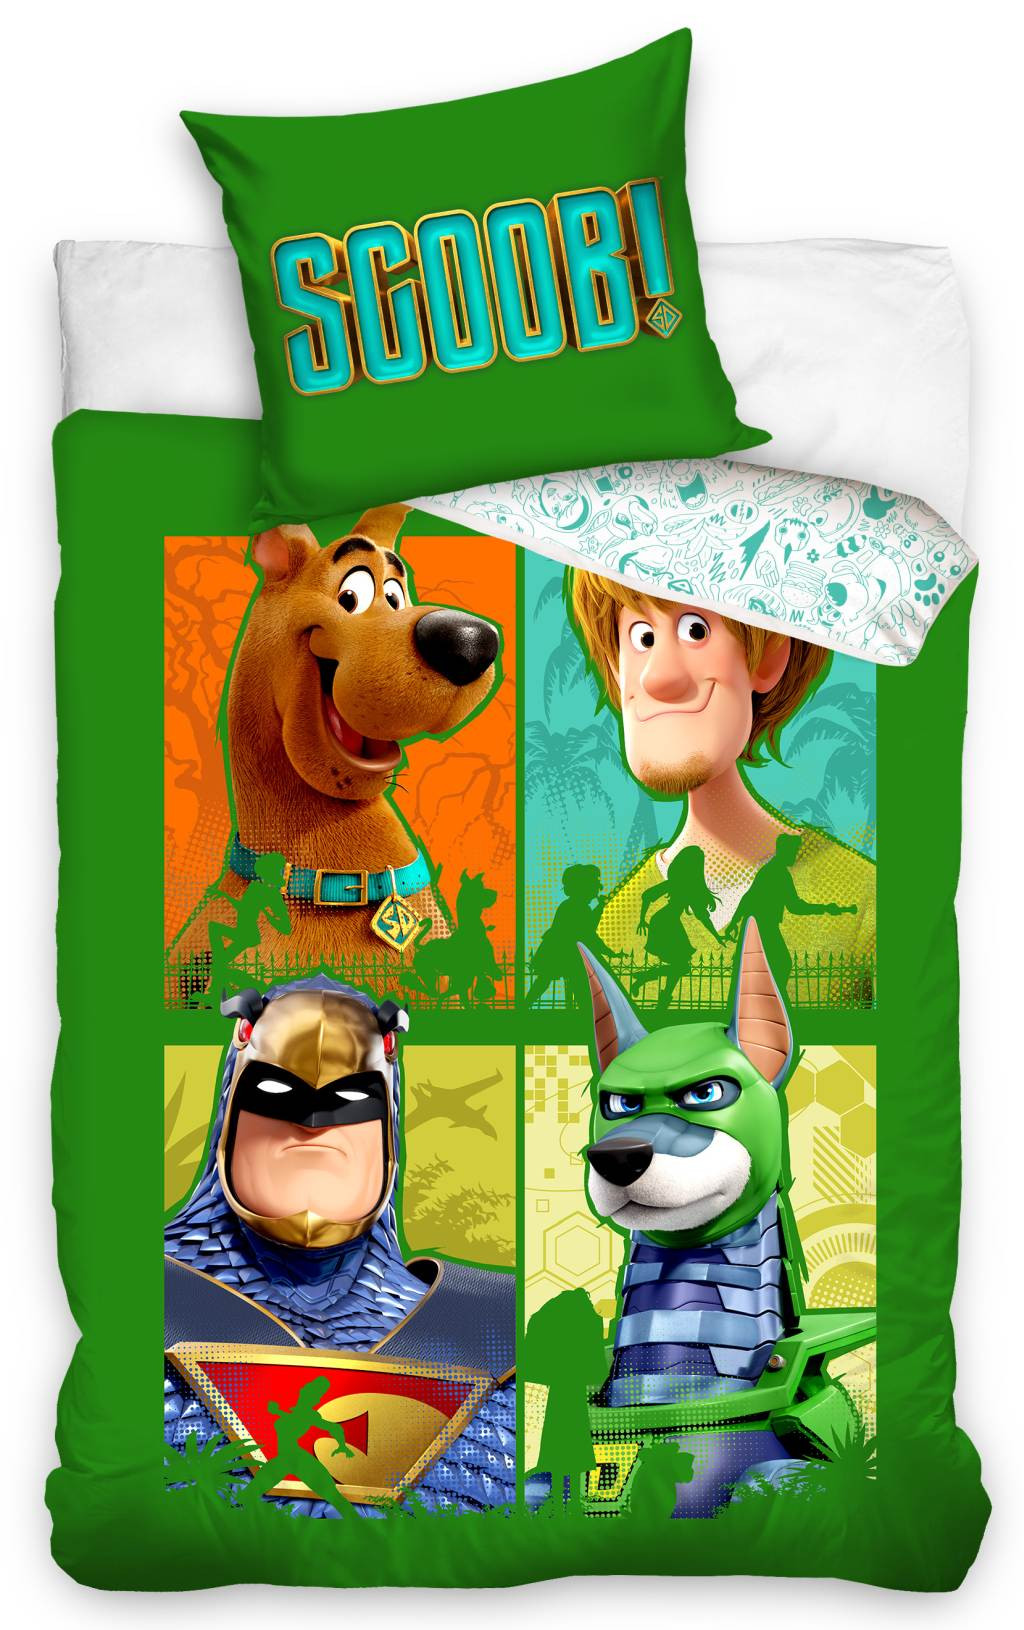 DomTextilu Zelené bavlnené obliečky s motívom Scooby Doo 70x90 cm 26057-150496